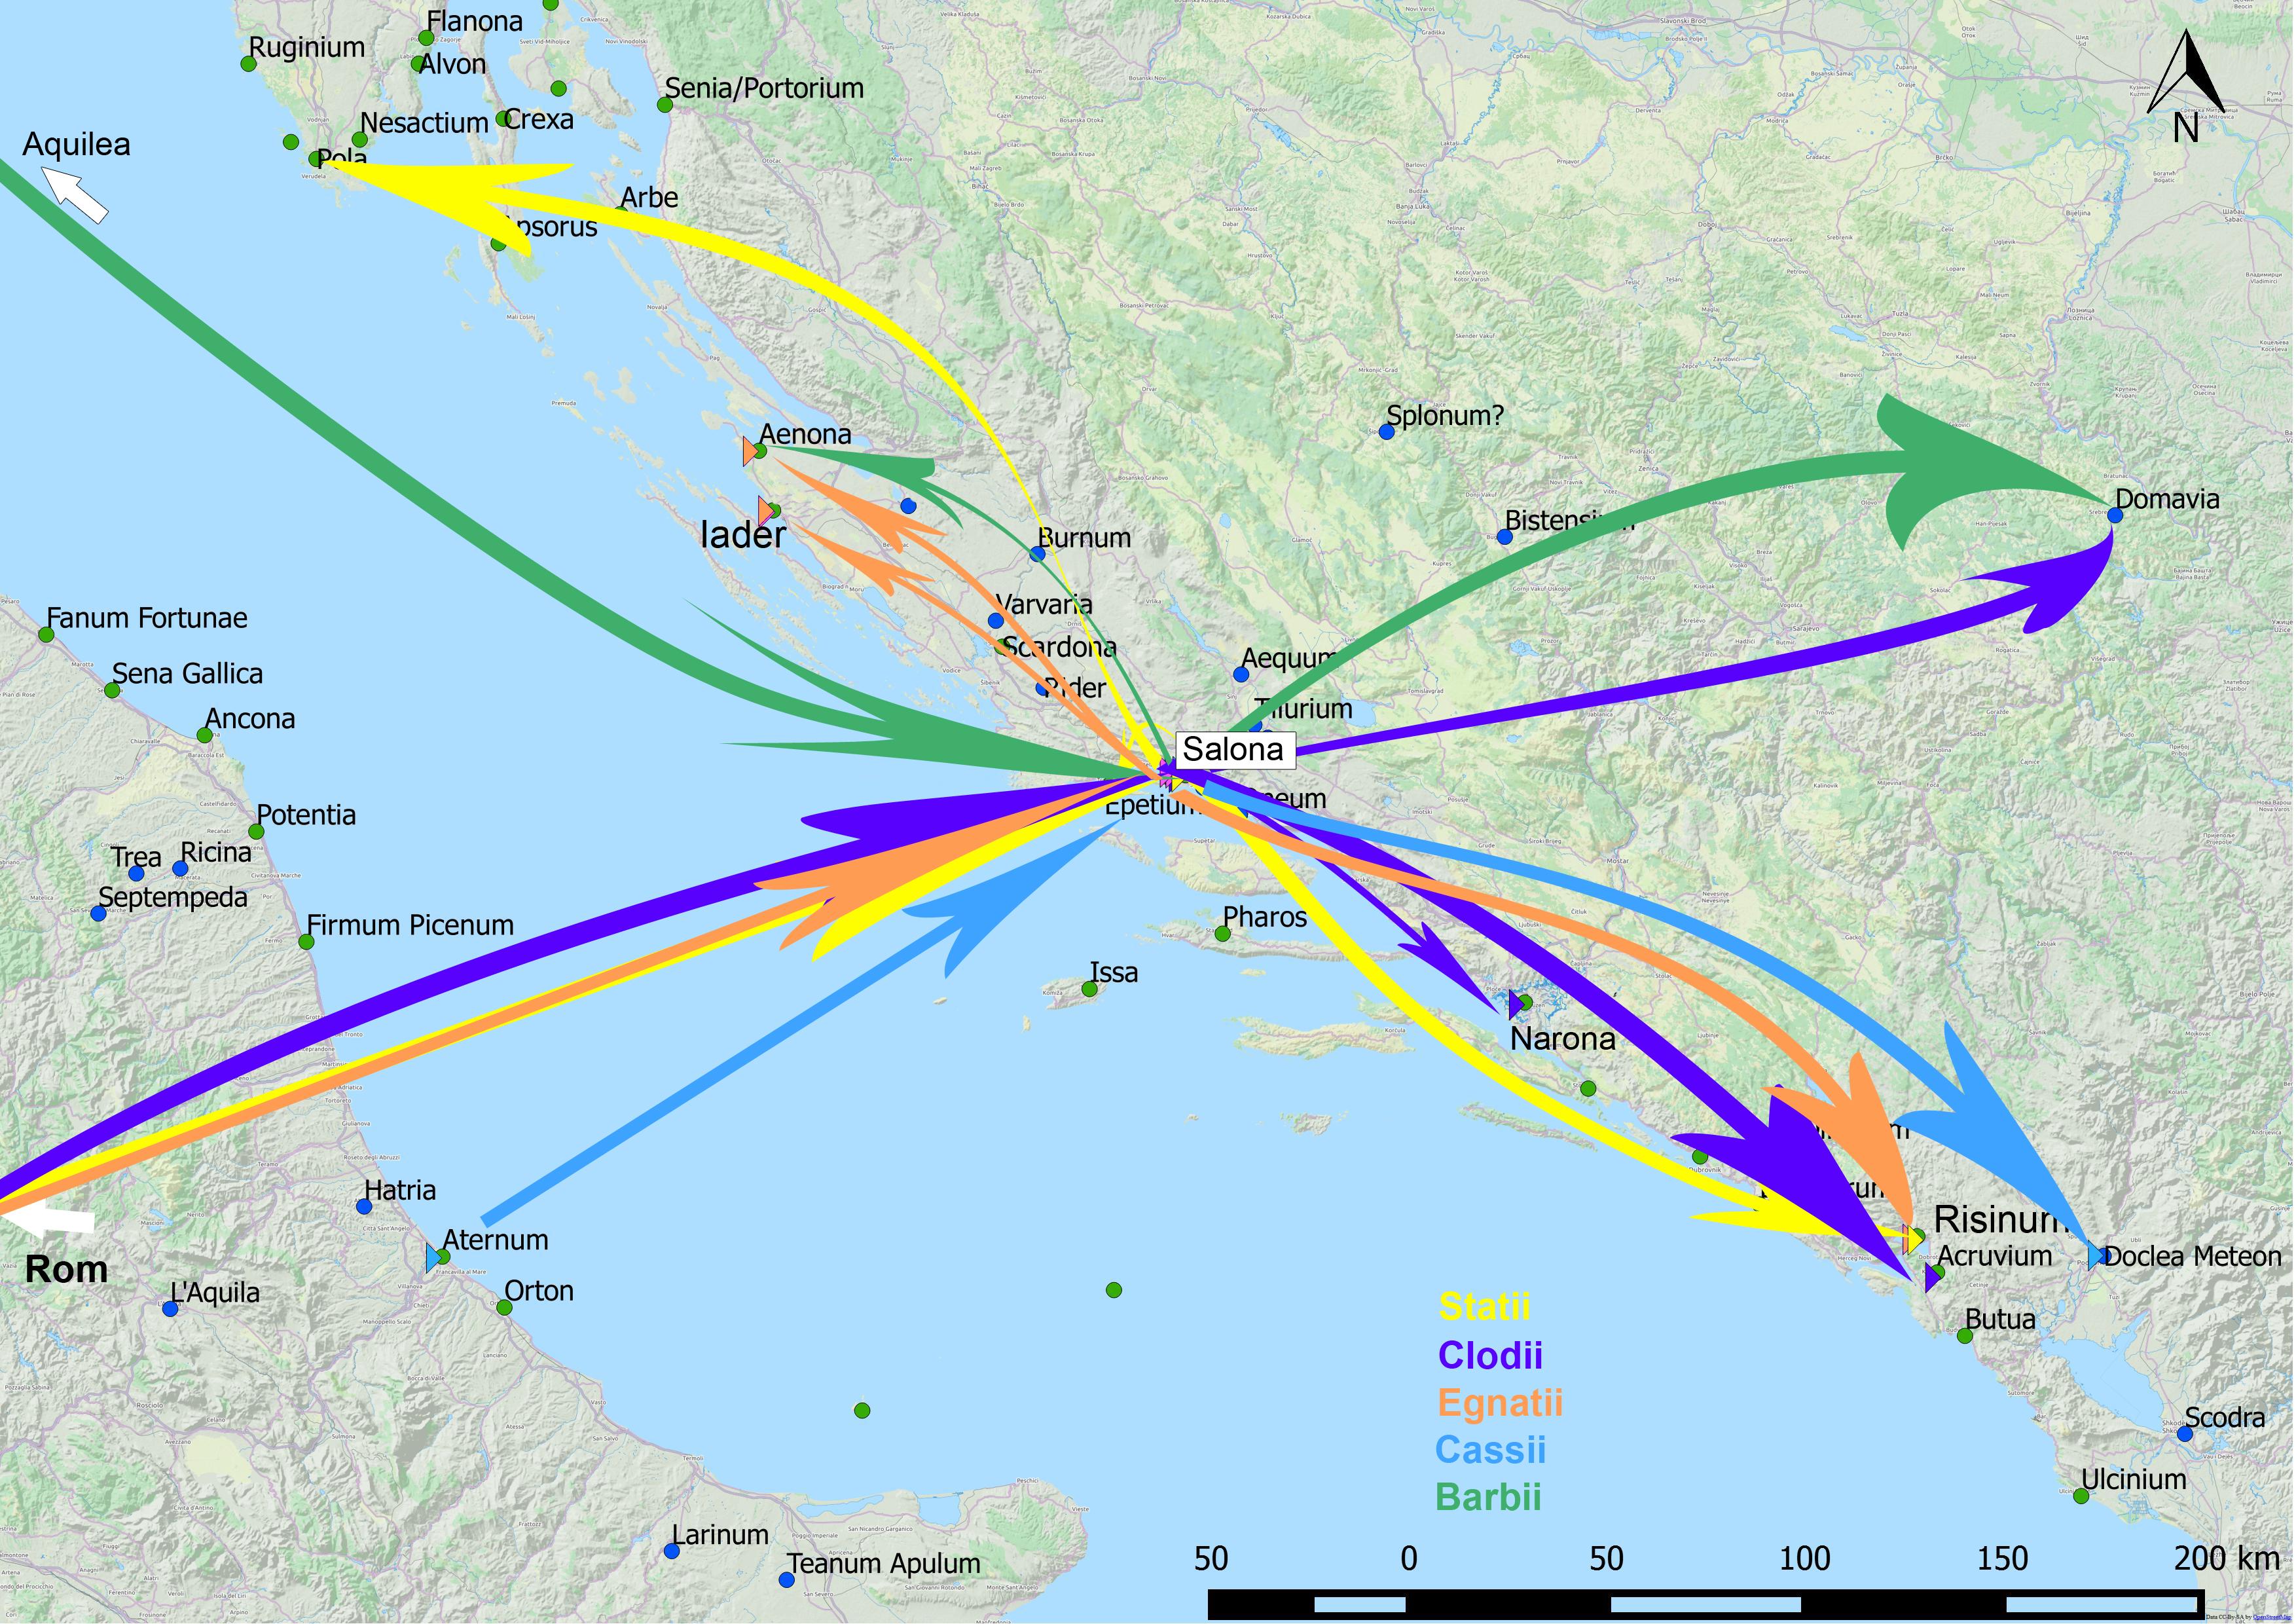 SPP Häfen: The Adriatic communication area on